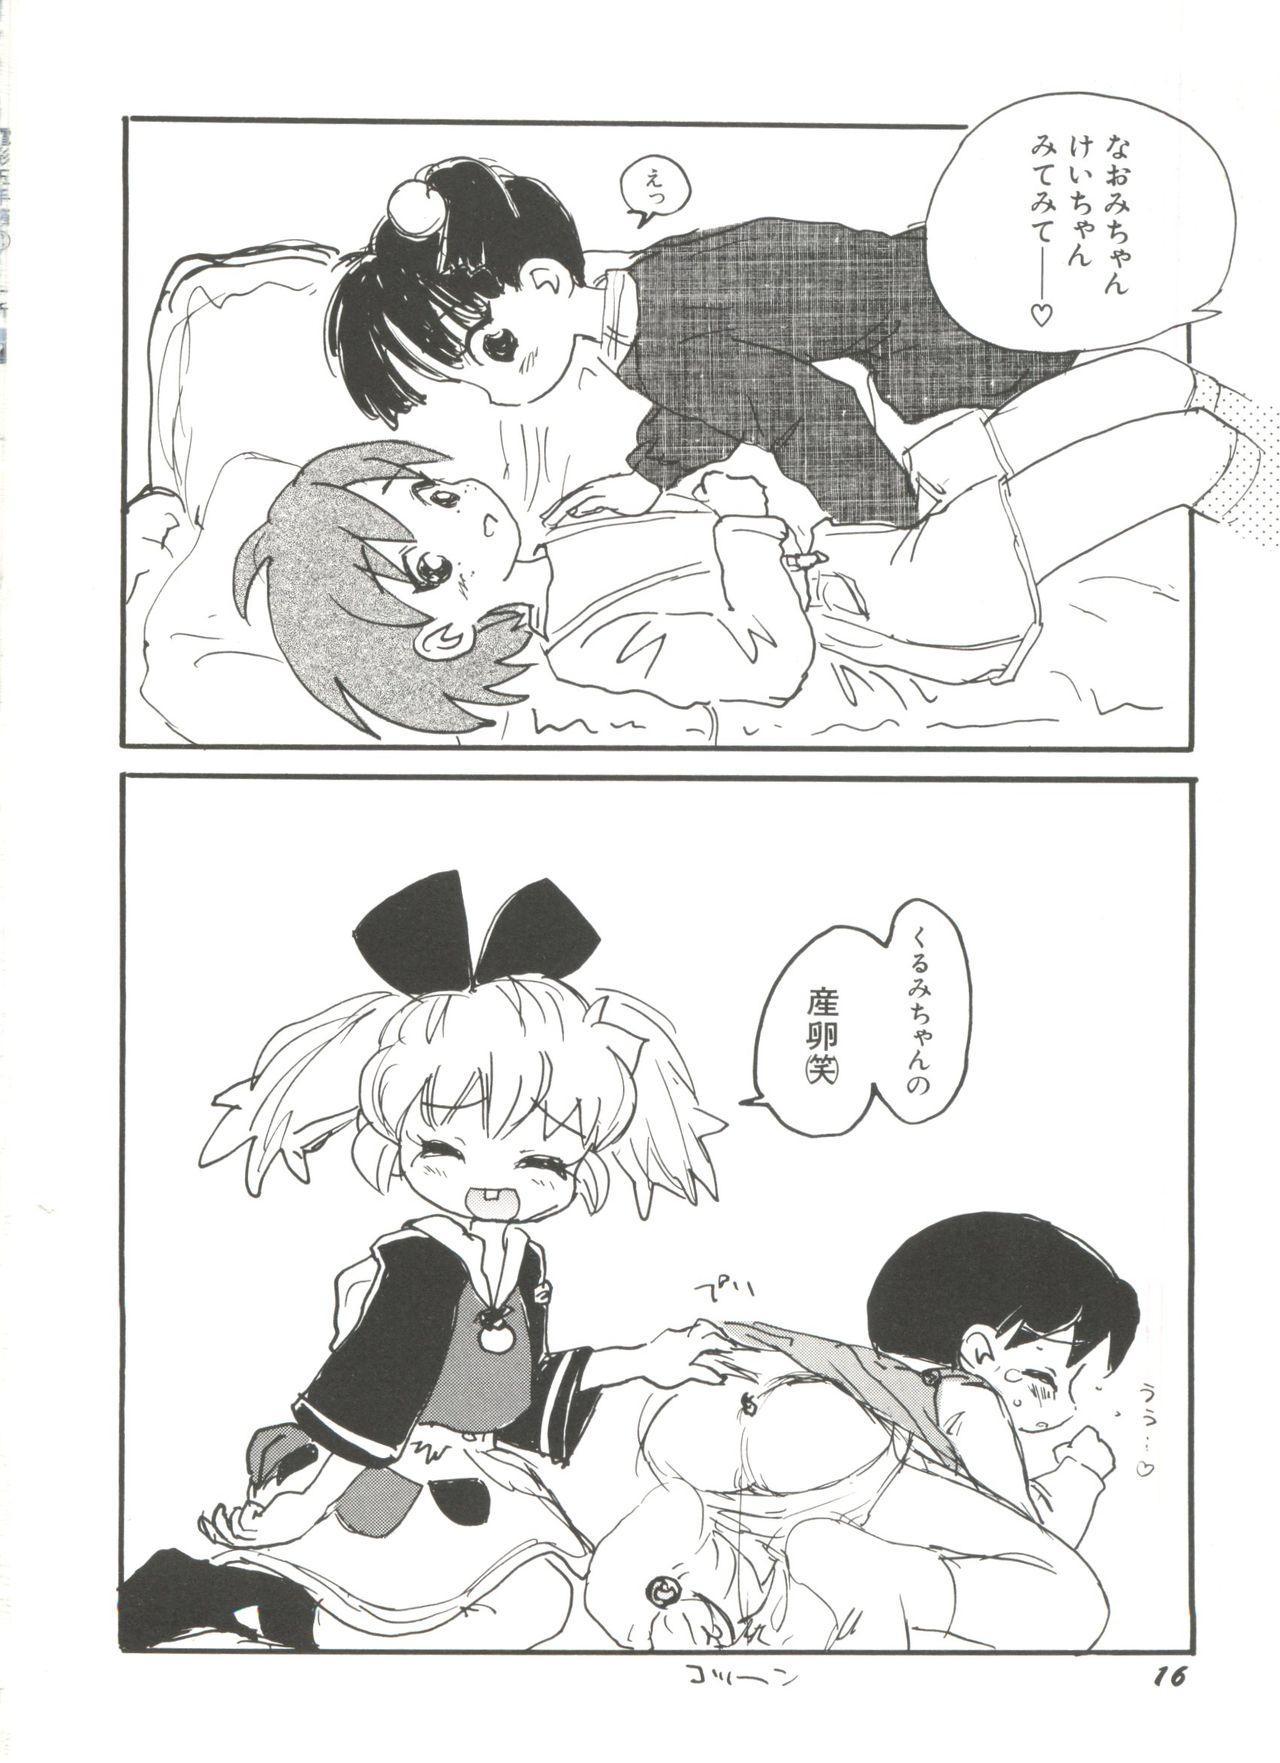 [Anthology] Denei Tamatebako 8 - Utakata no Tenshi-tachi II (Various) 17